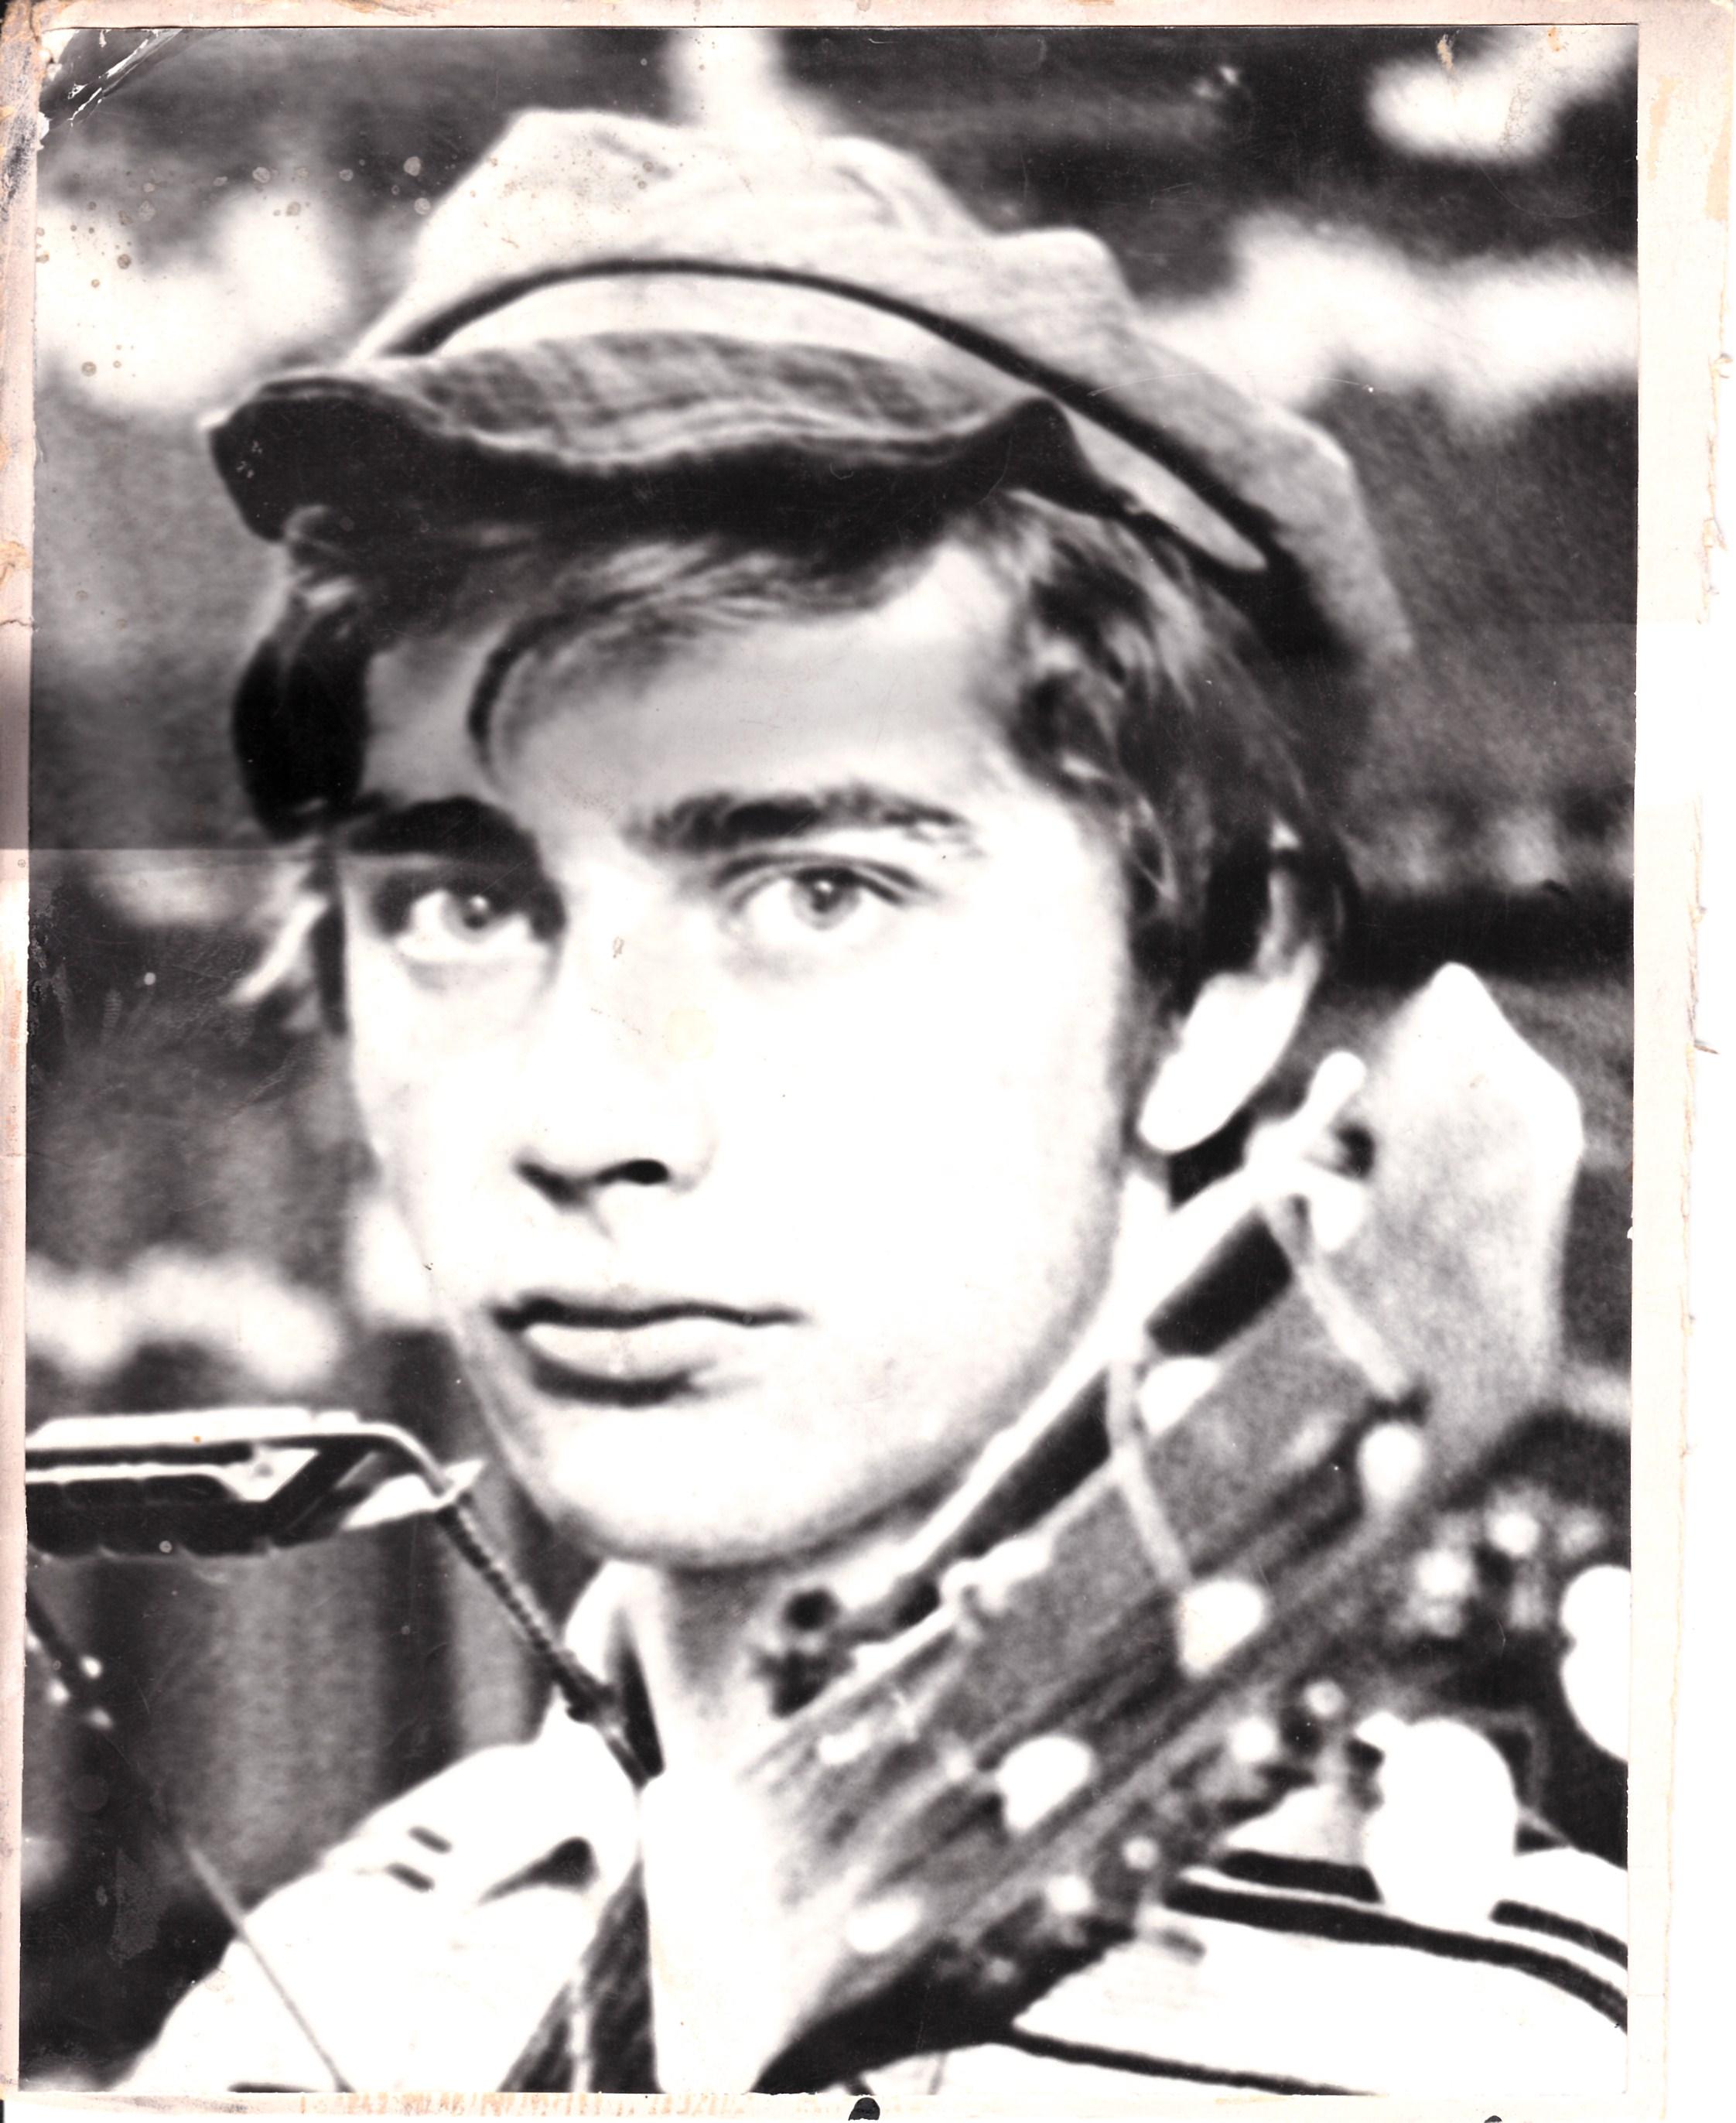 dinnyes_jozsef_1967.jpg